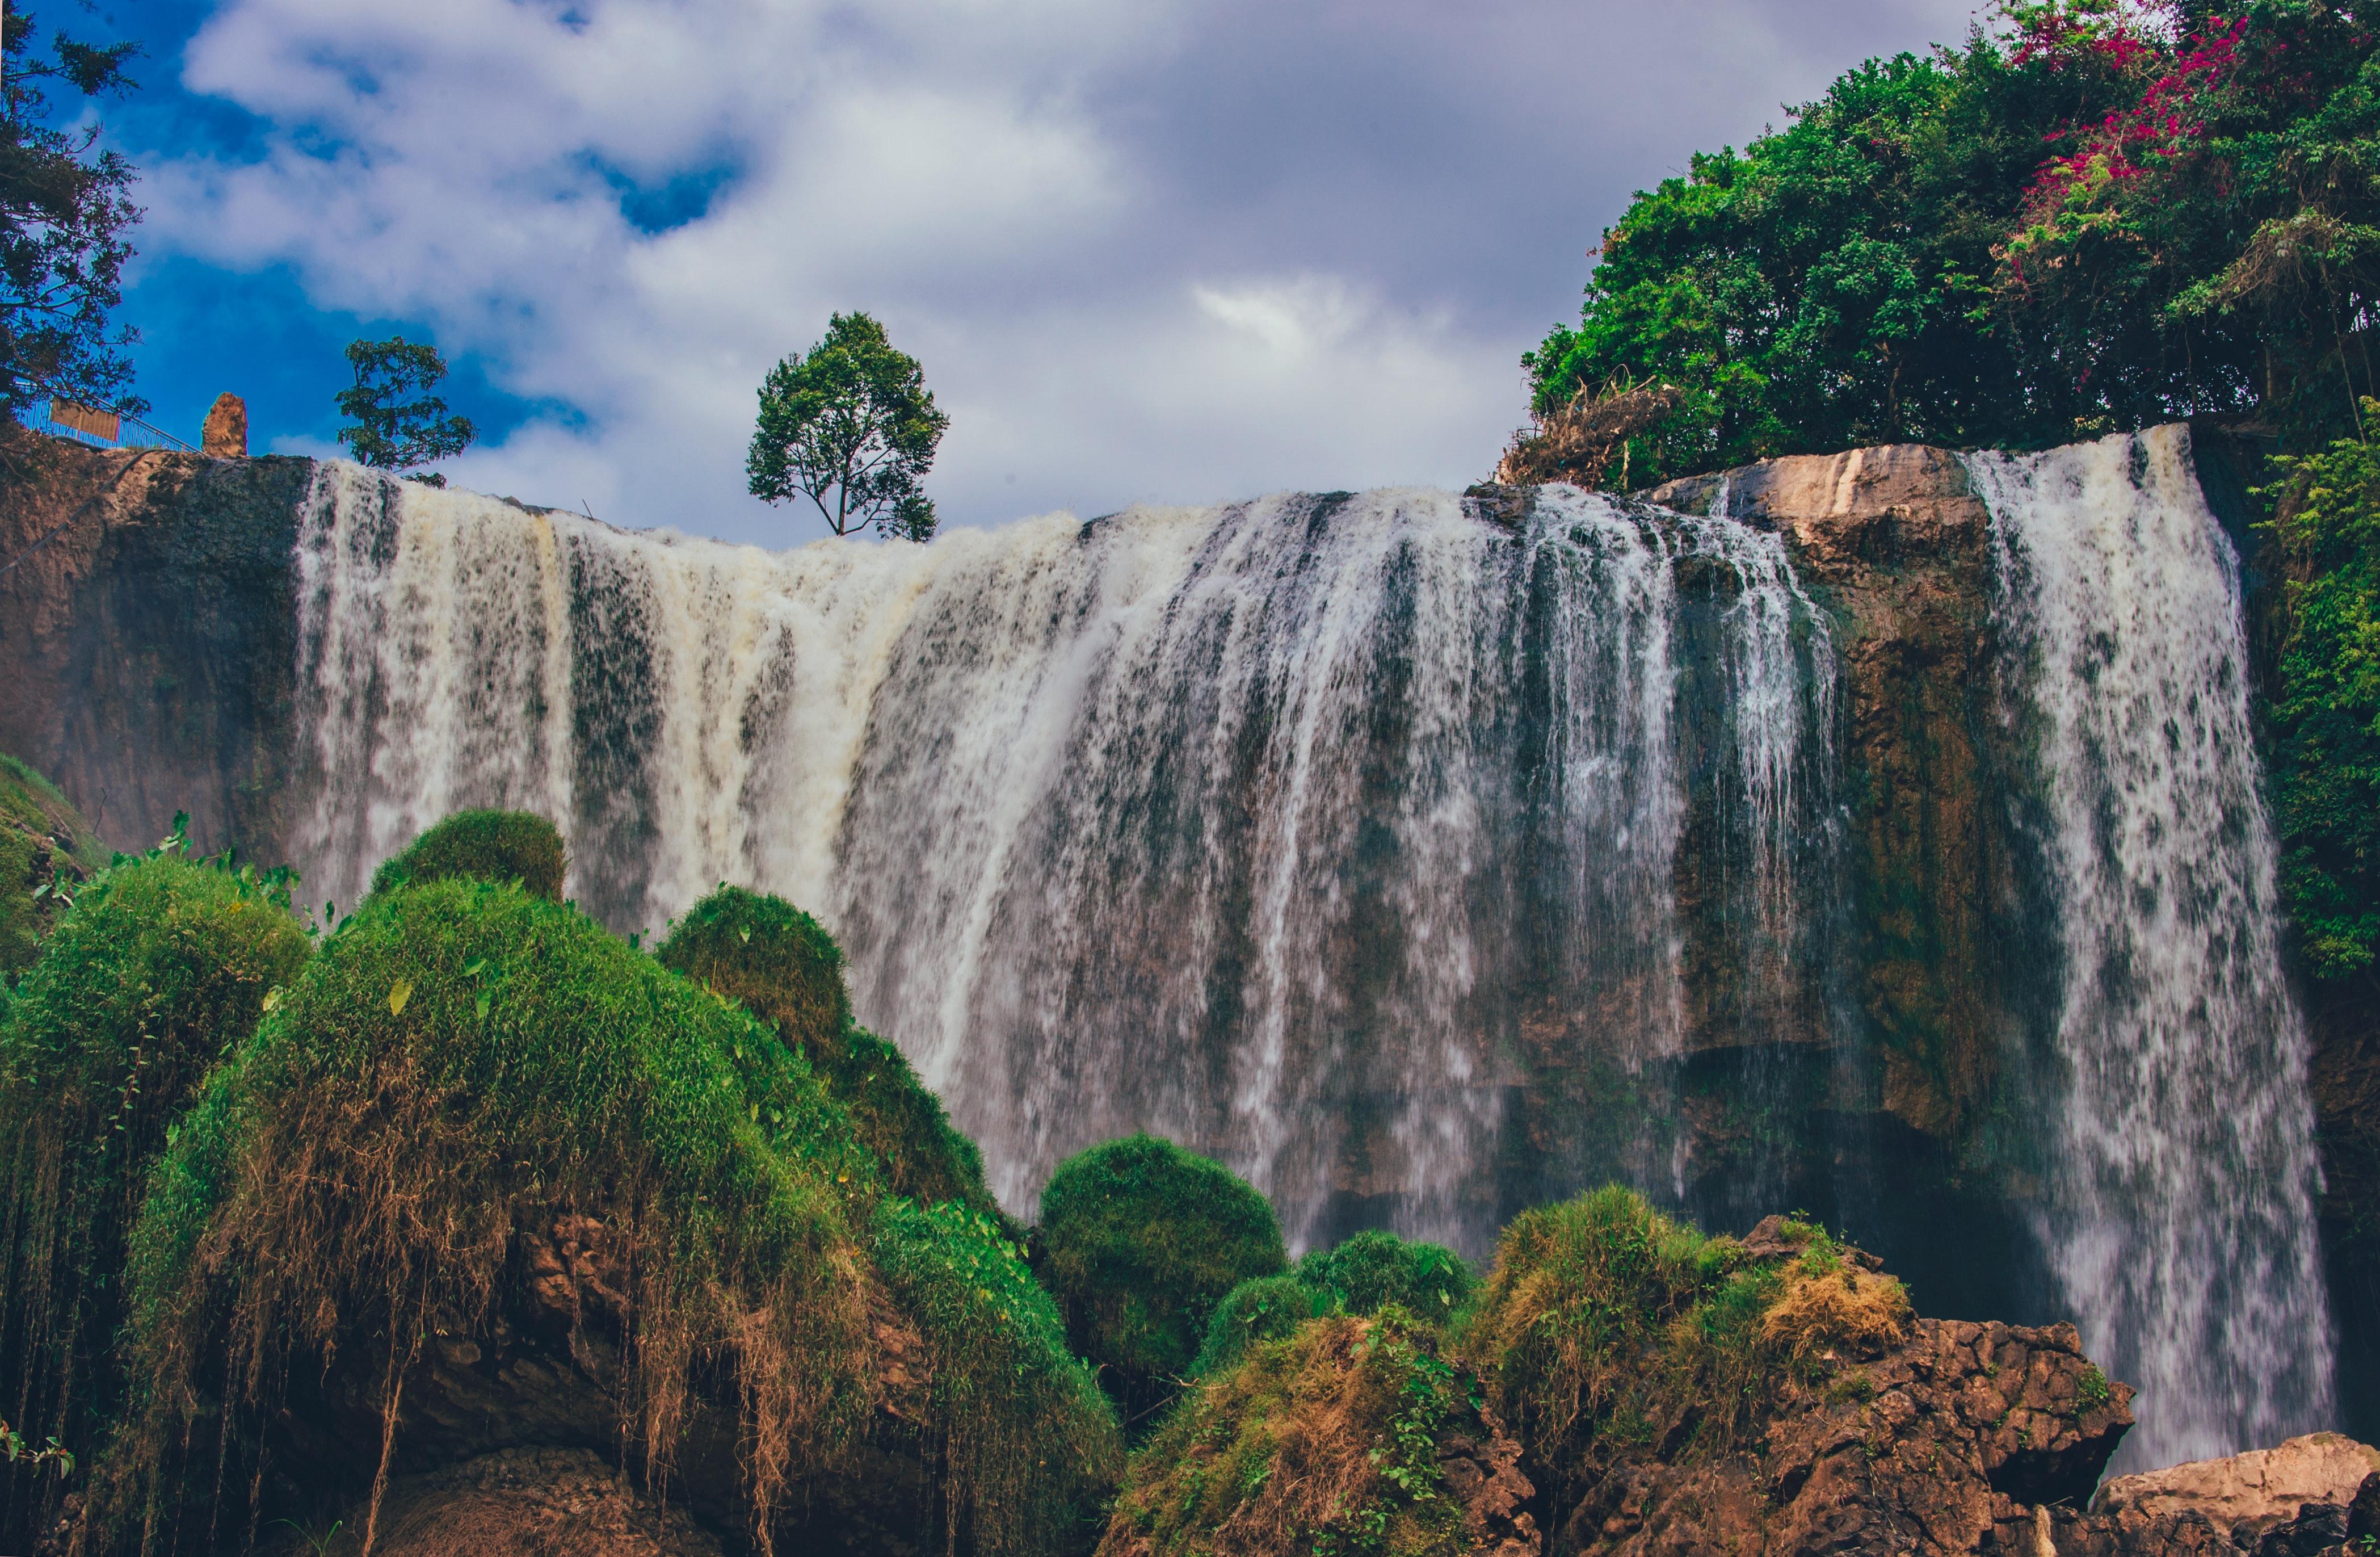 Waterfalls, Stones, Scenic, Rocks, Time lapse, HQ Photo